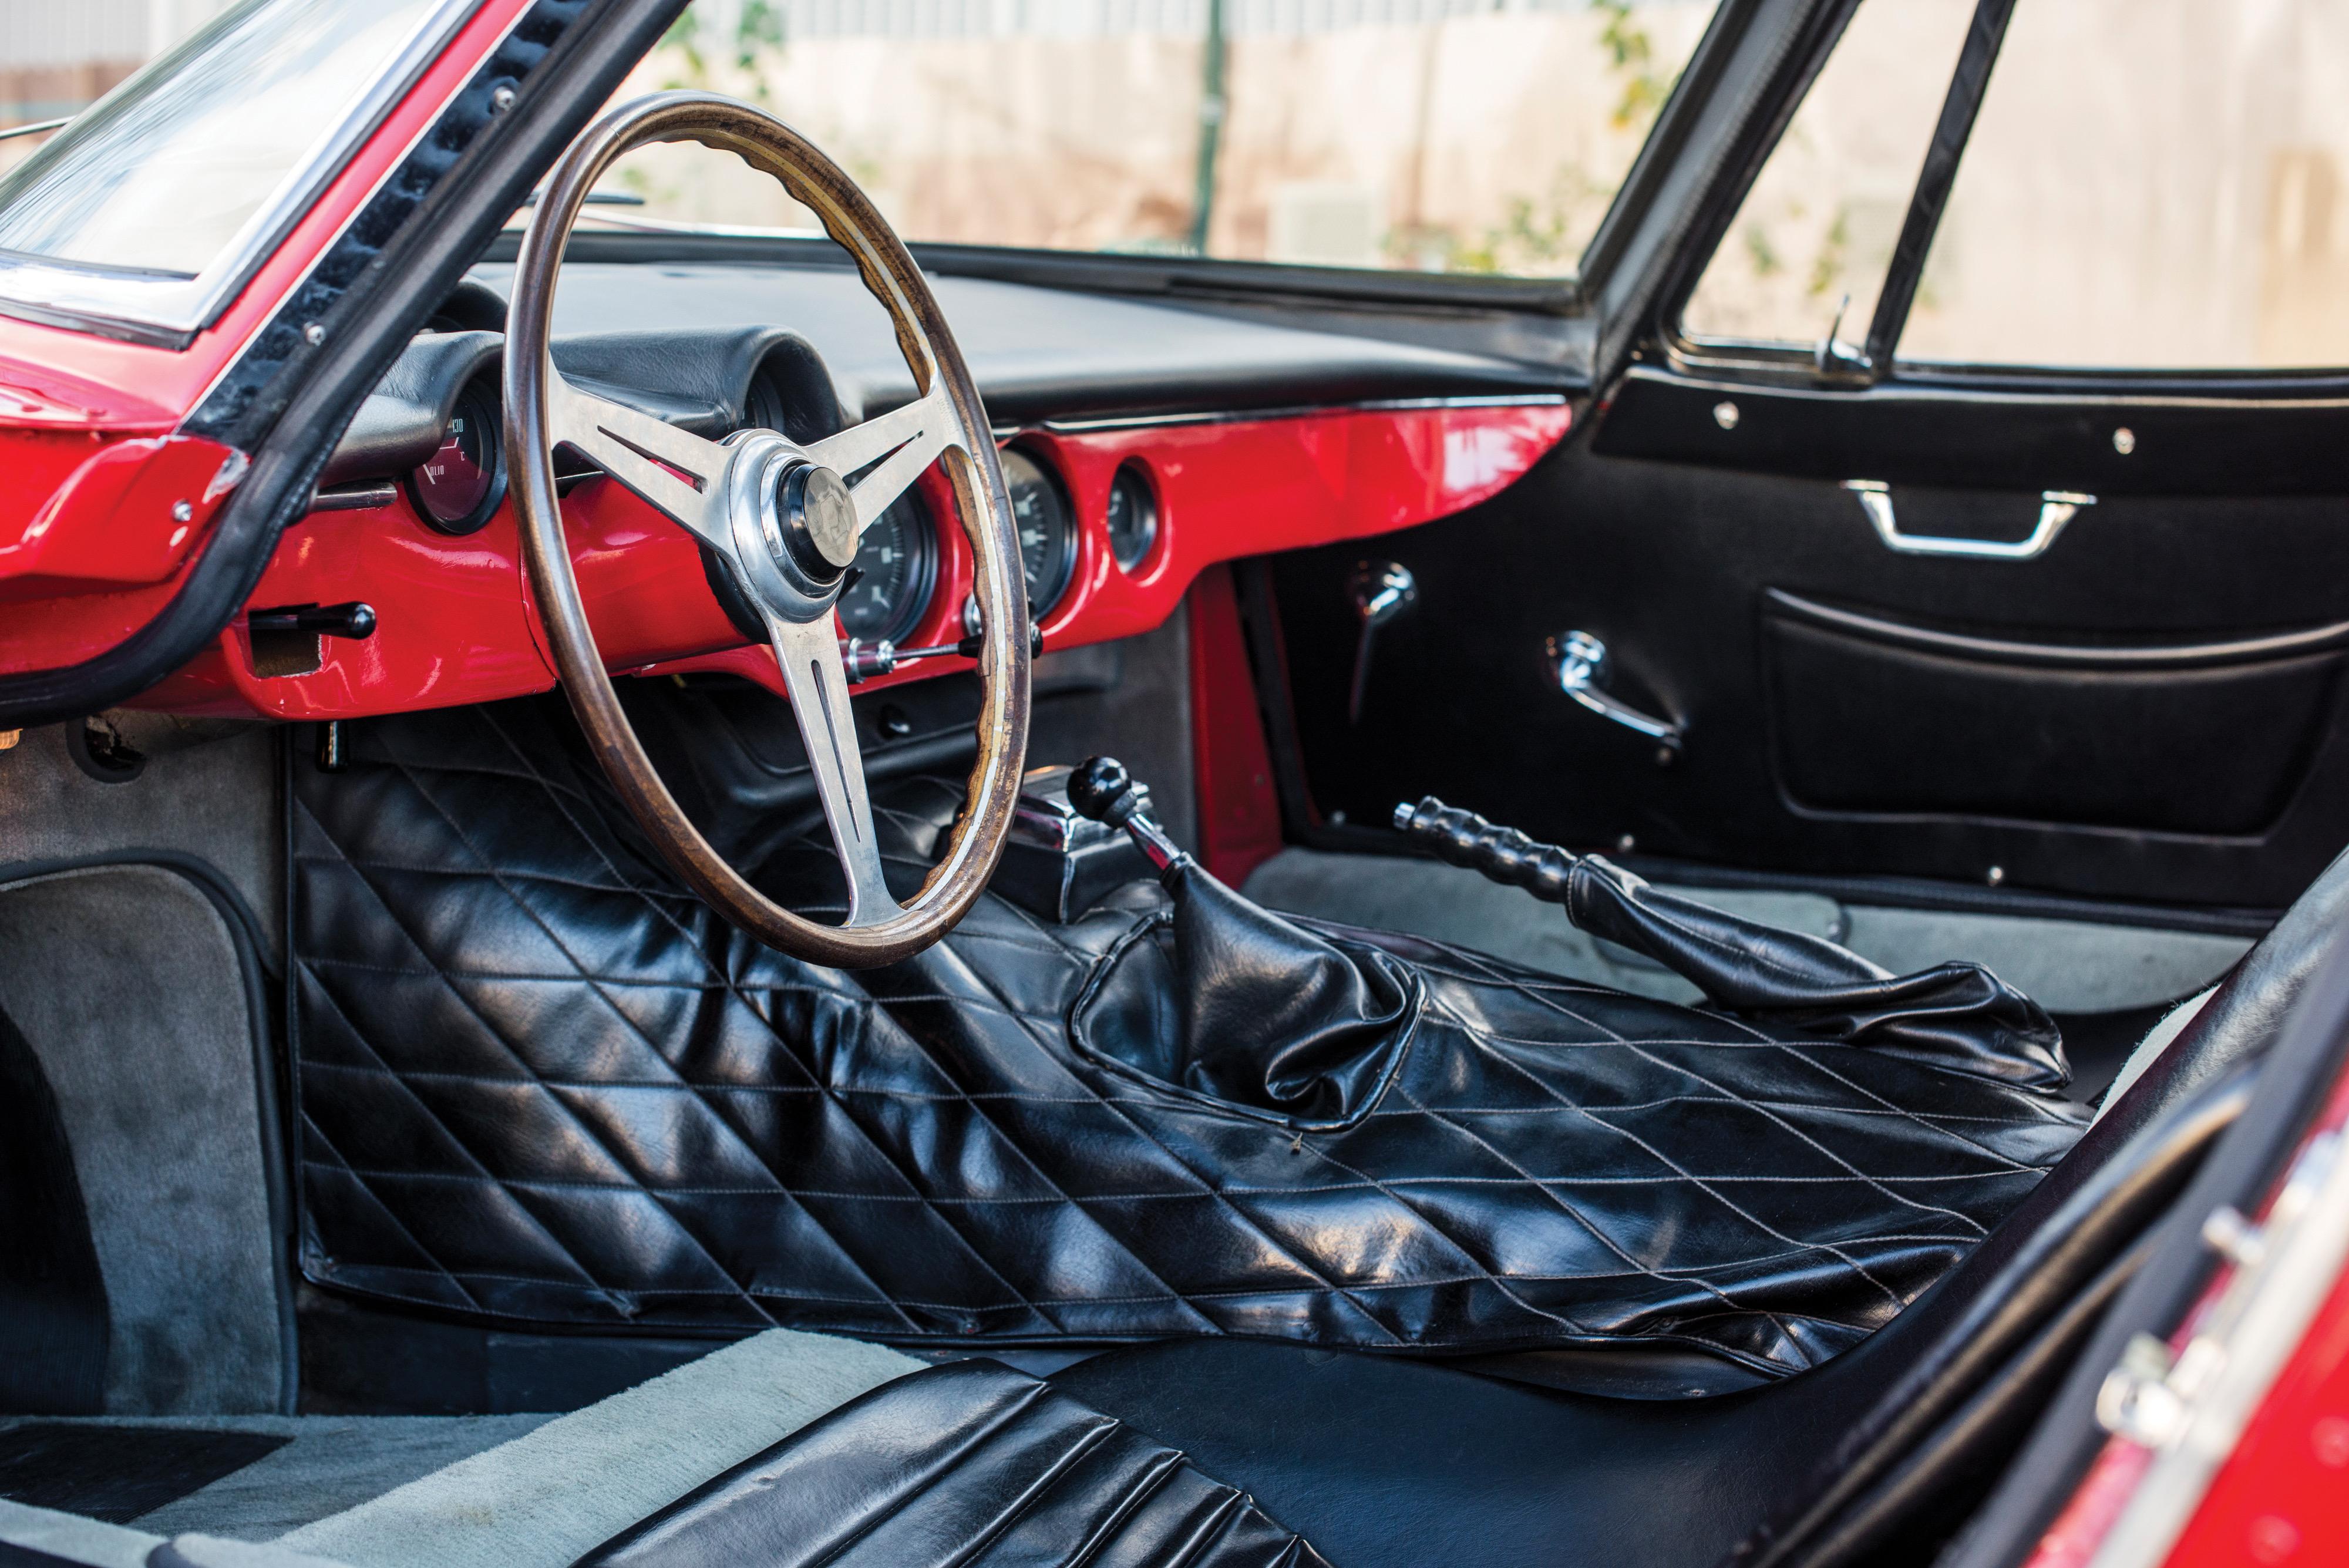 , Movie-star Ferrari, entertainer's Iso Grifo join RM Sotheby's Paris docket, ClassicCars.com Journal